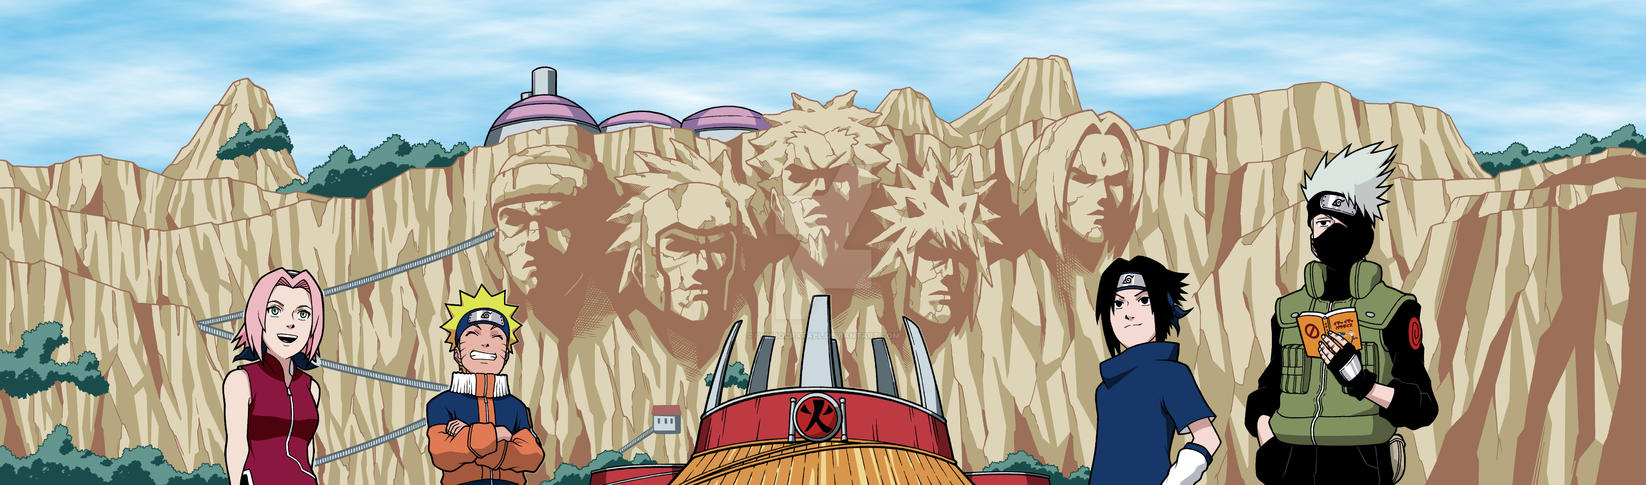 Naruto Team 7 Hokage Rock (Colored) by GumbocRafael ...